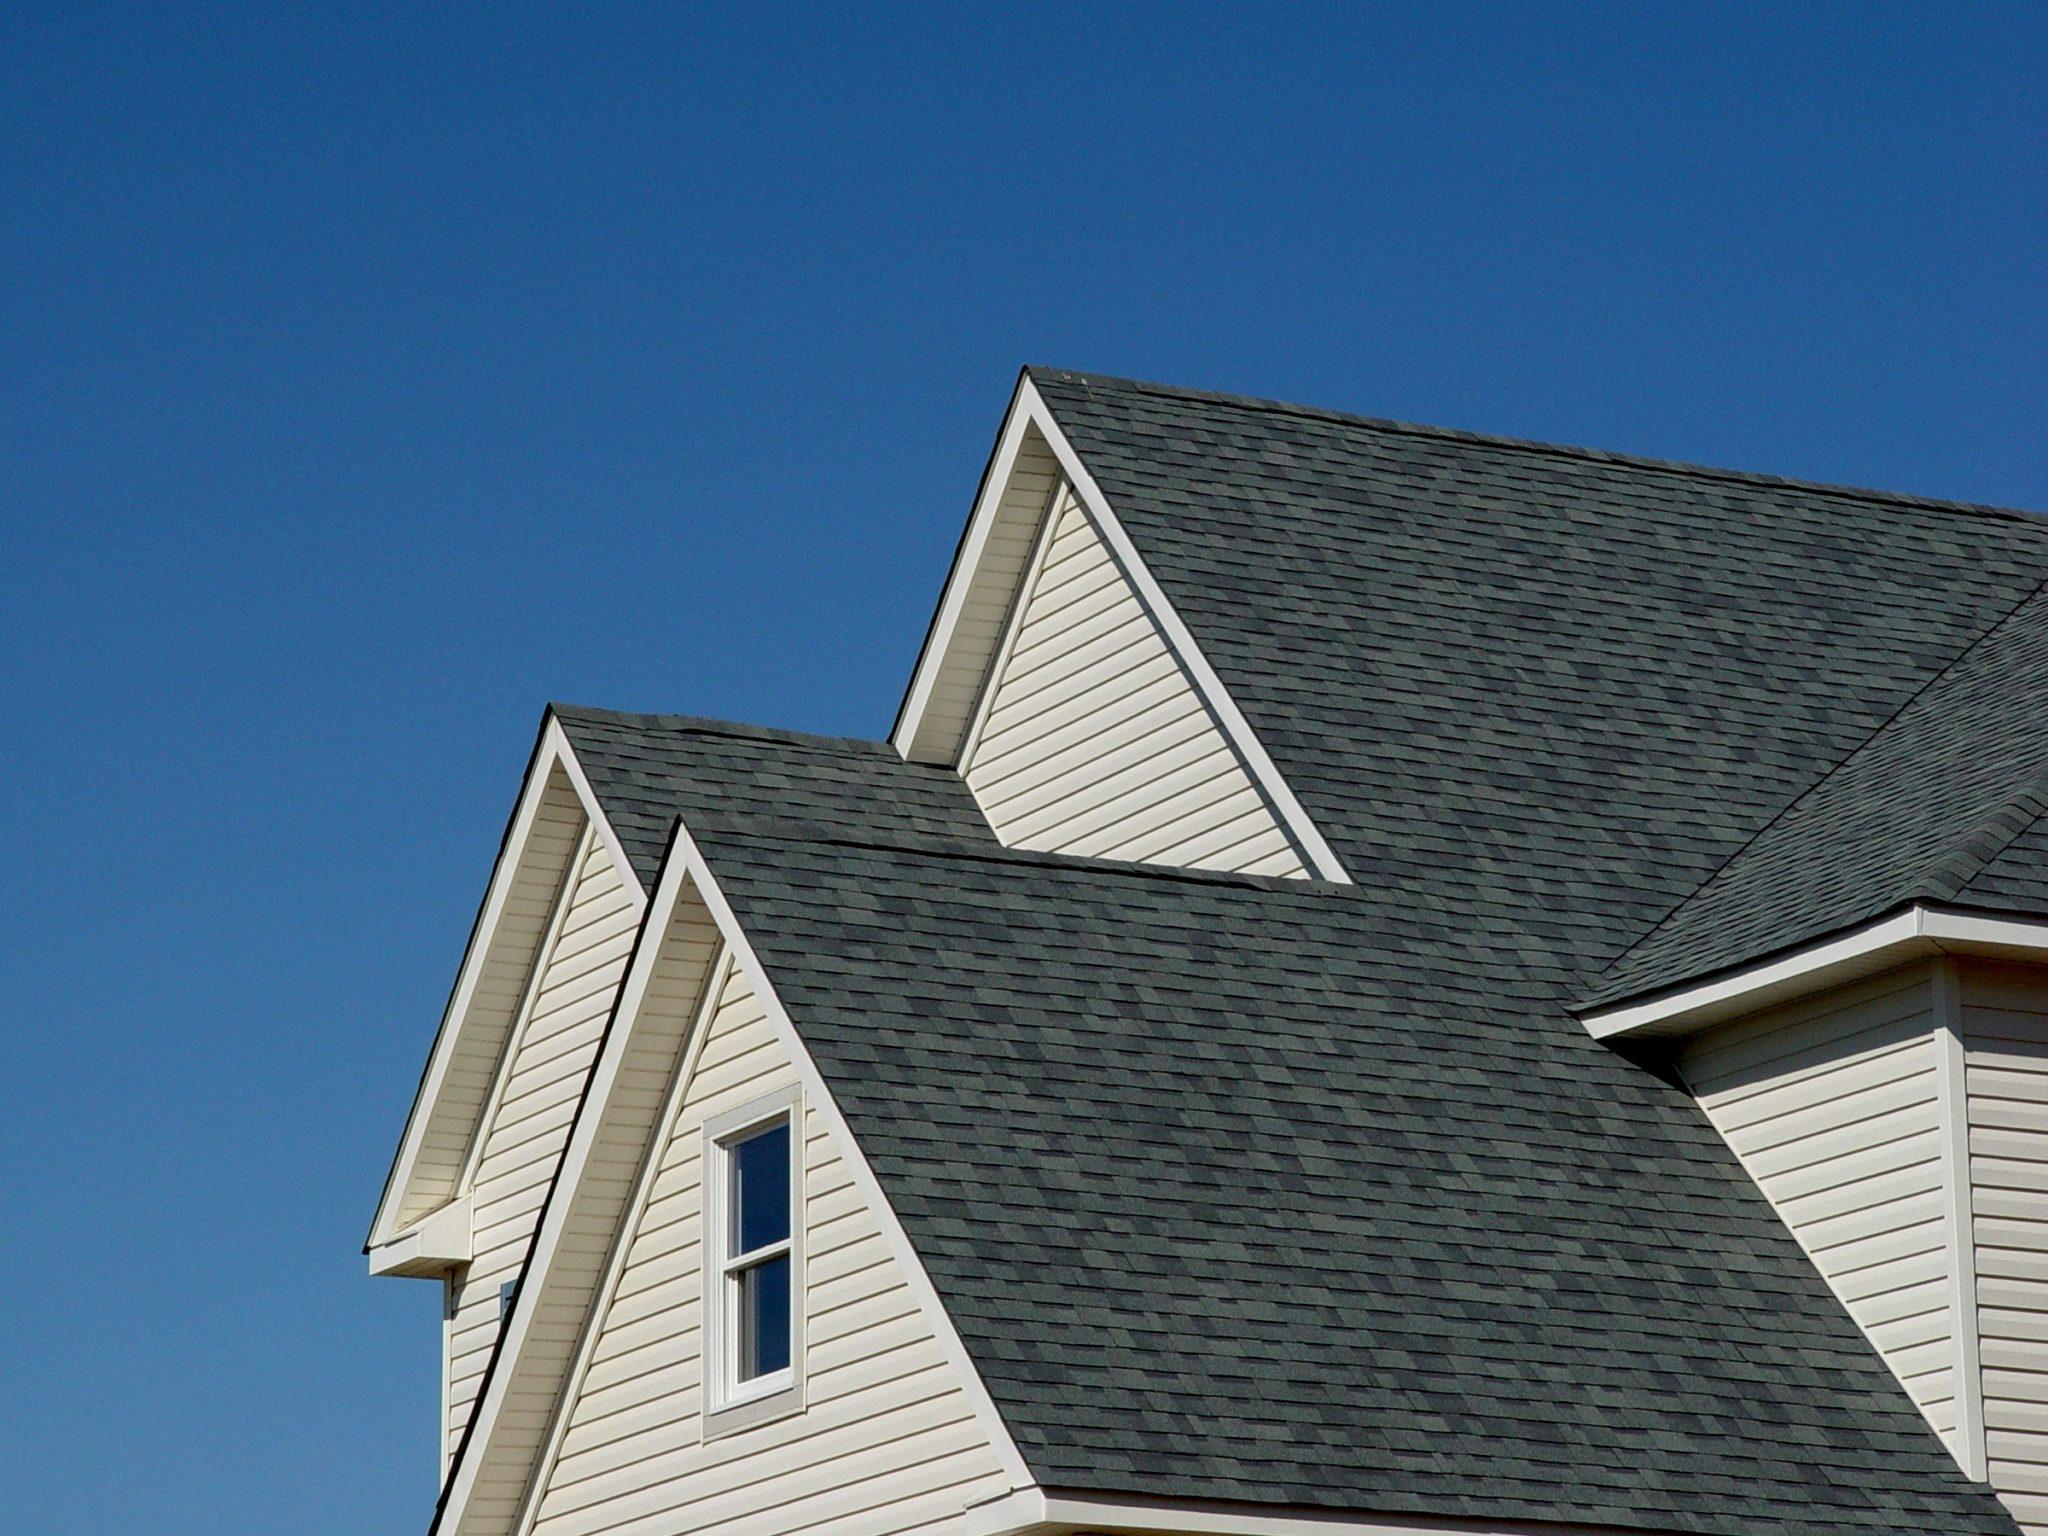 Roofing Contractors Urbandale IA